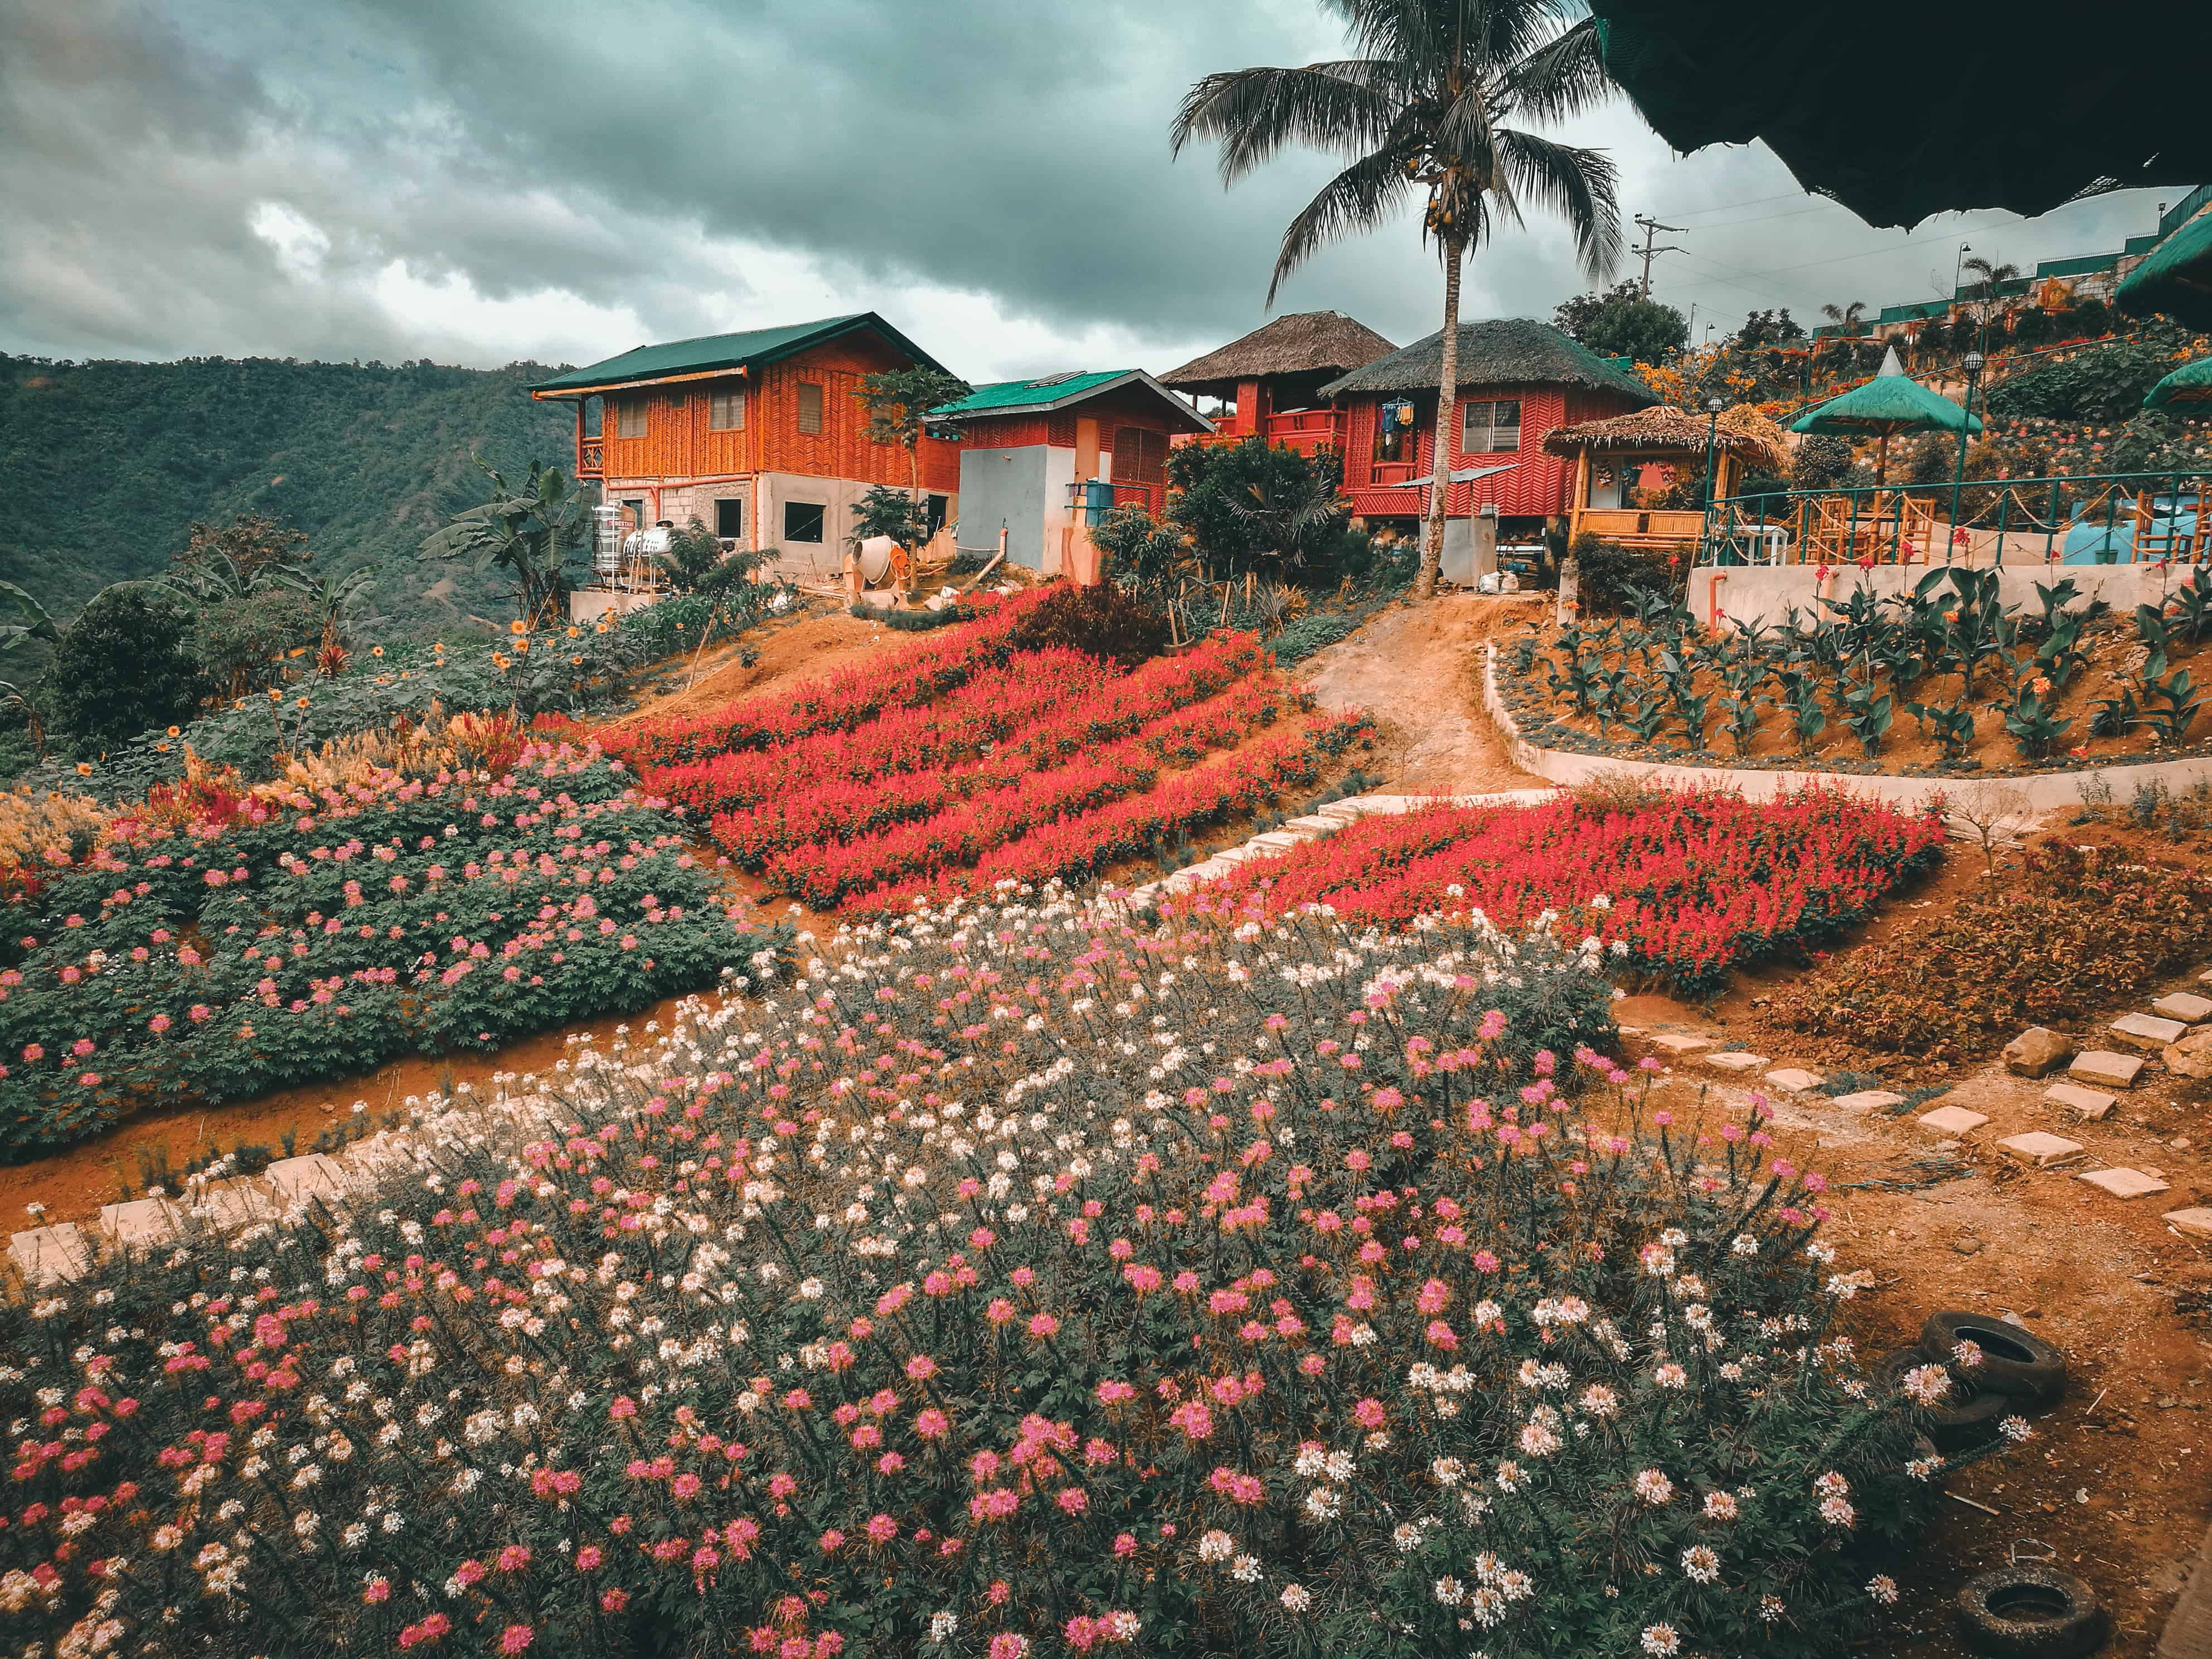 MSDEA Ornamental Garden Cebu City (7)